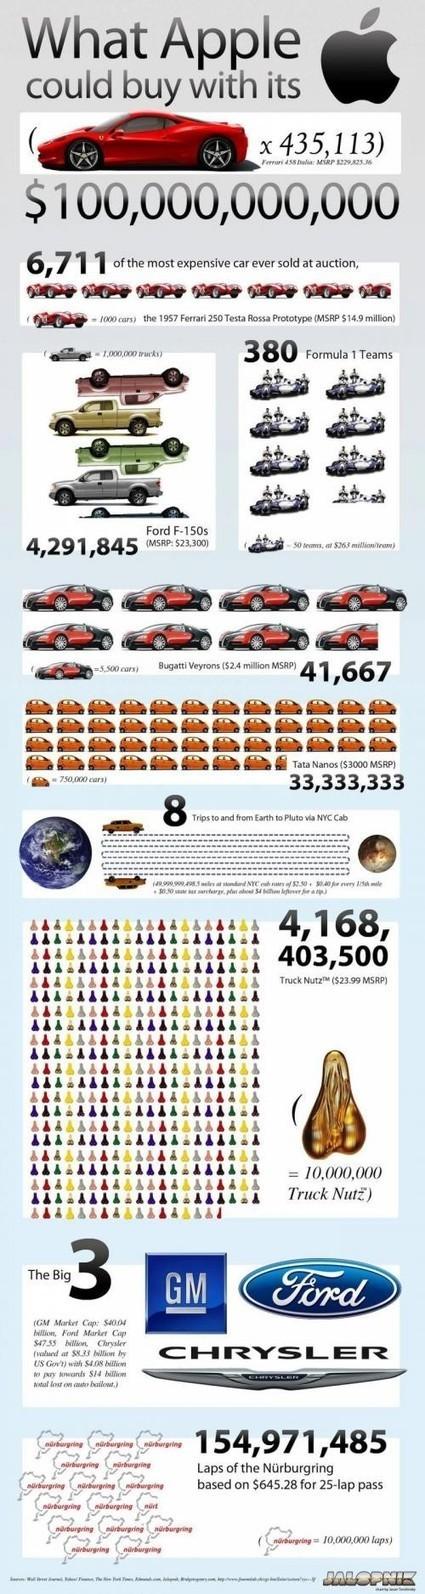 infographics | KgTechnology | Scoop.it